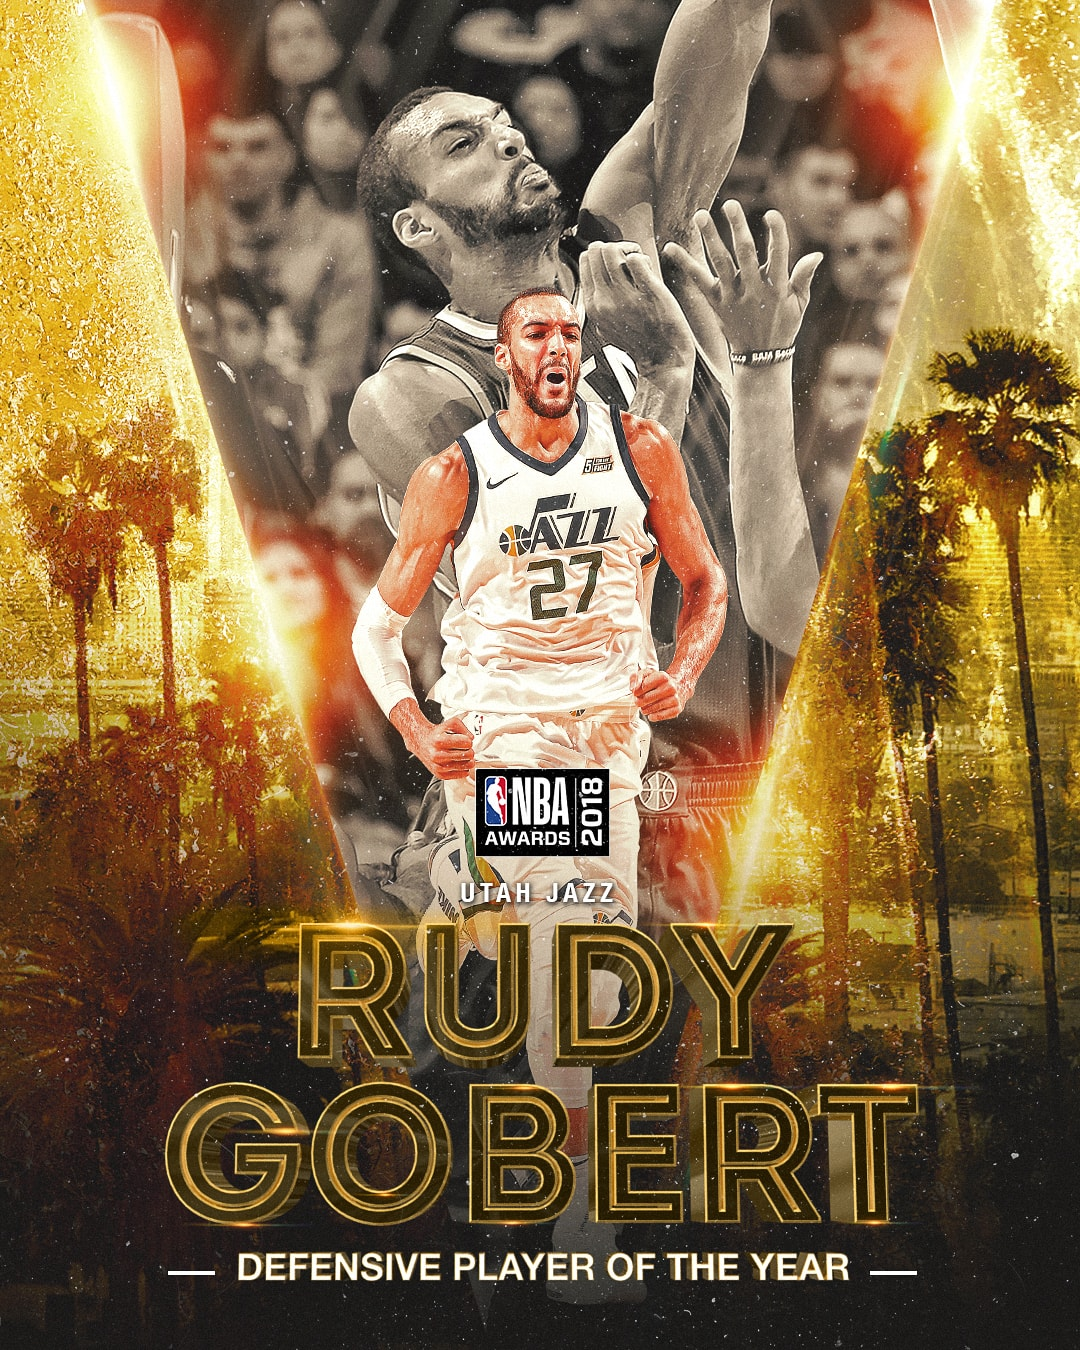 NBA Awards NBA Defensive Player of the Year Award - Rudy Gobert